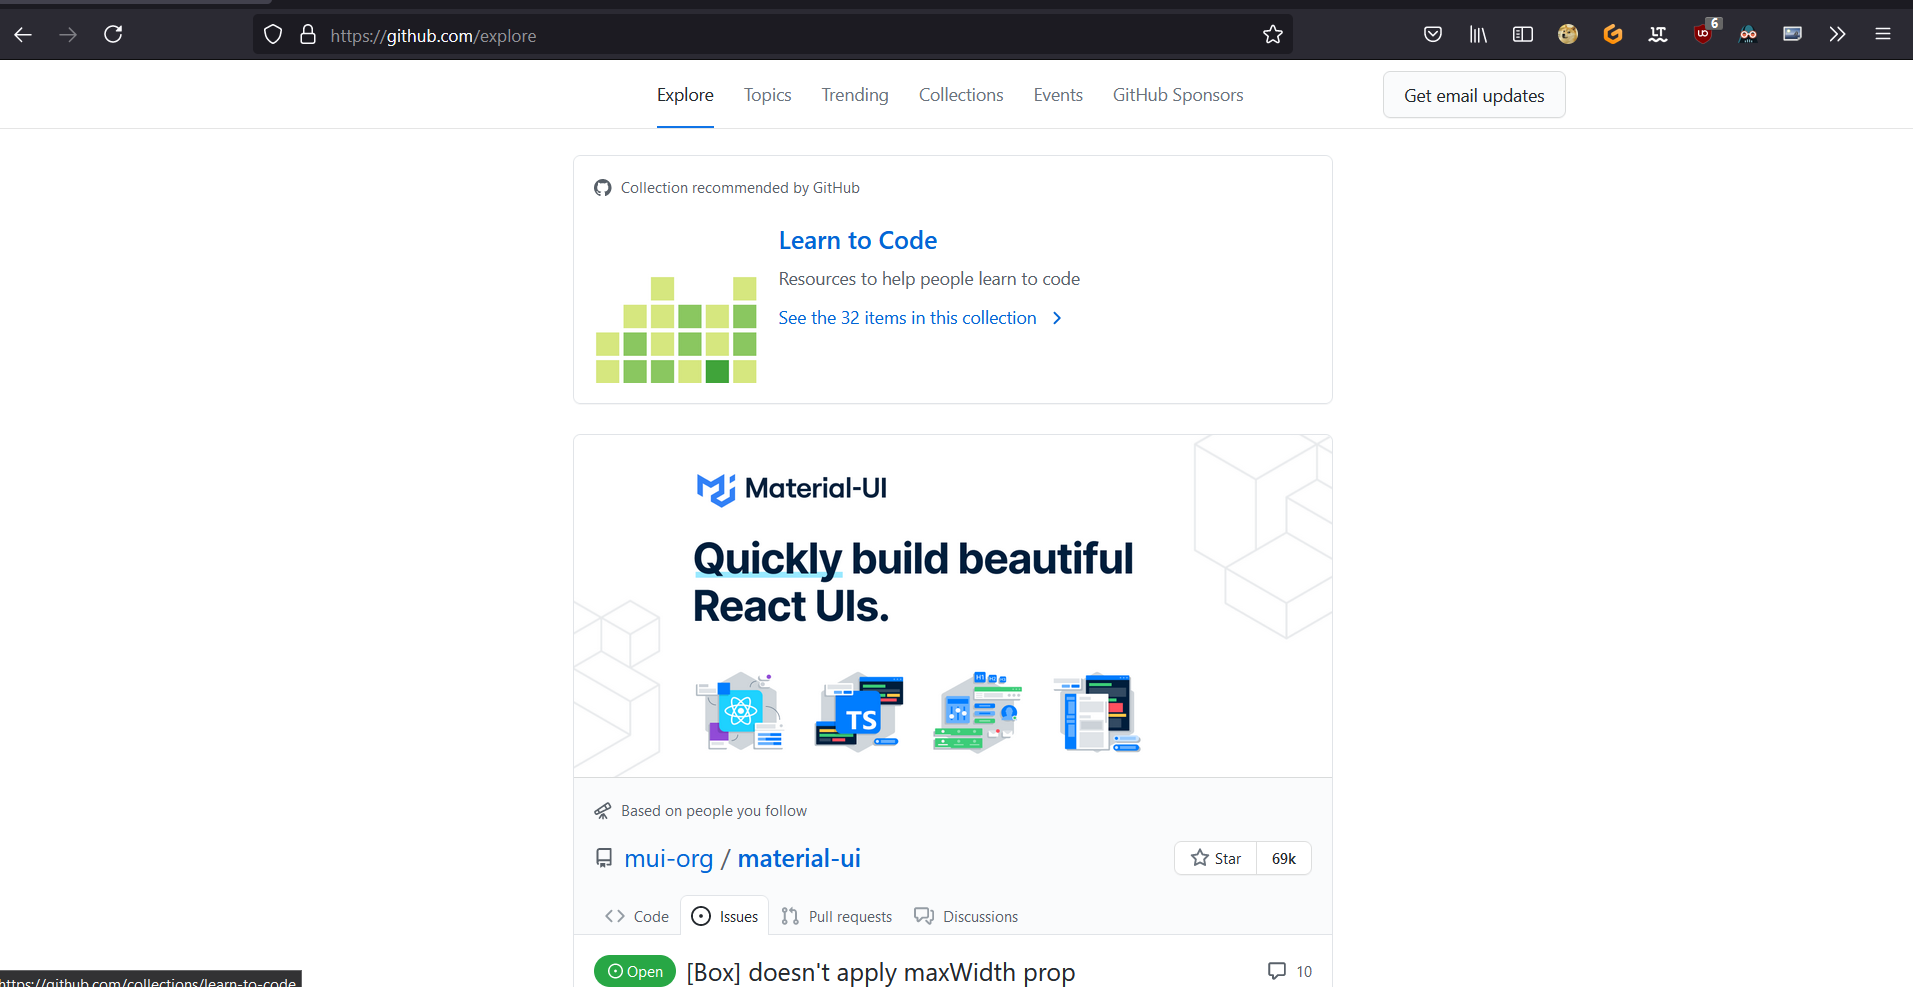 https://cloud-je0uiqmt0-hack-club-bot.vercel.app/0image.png